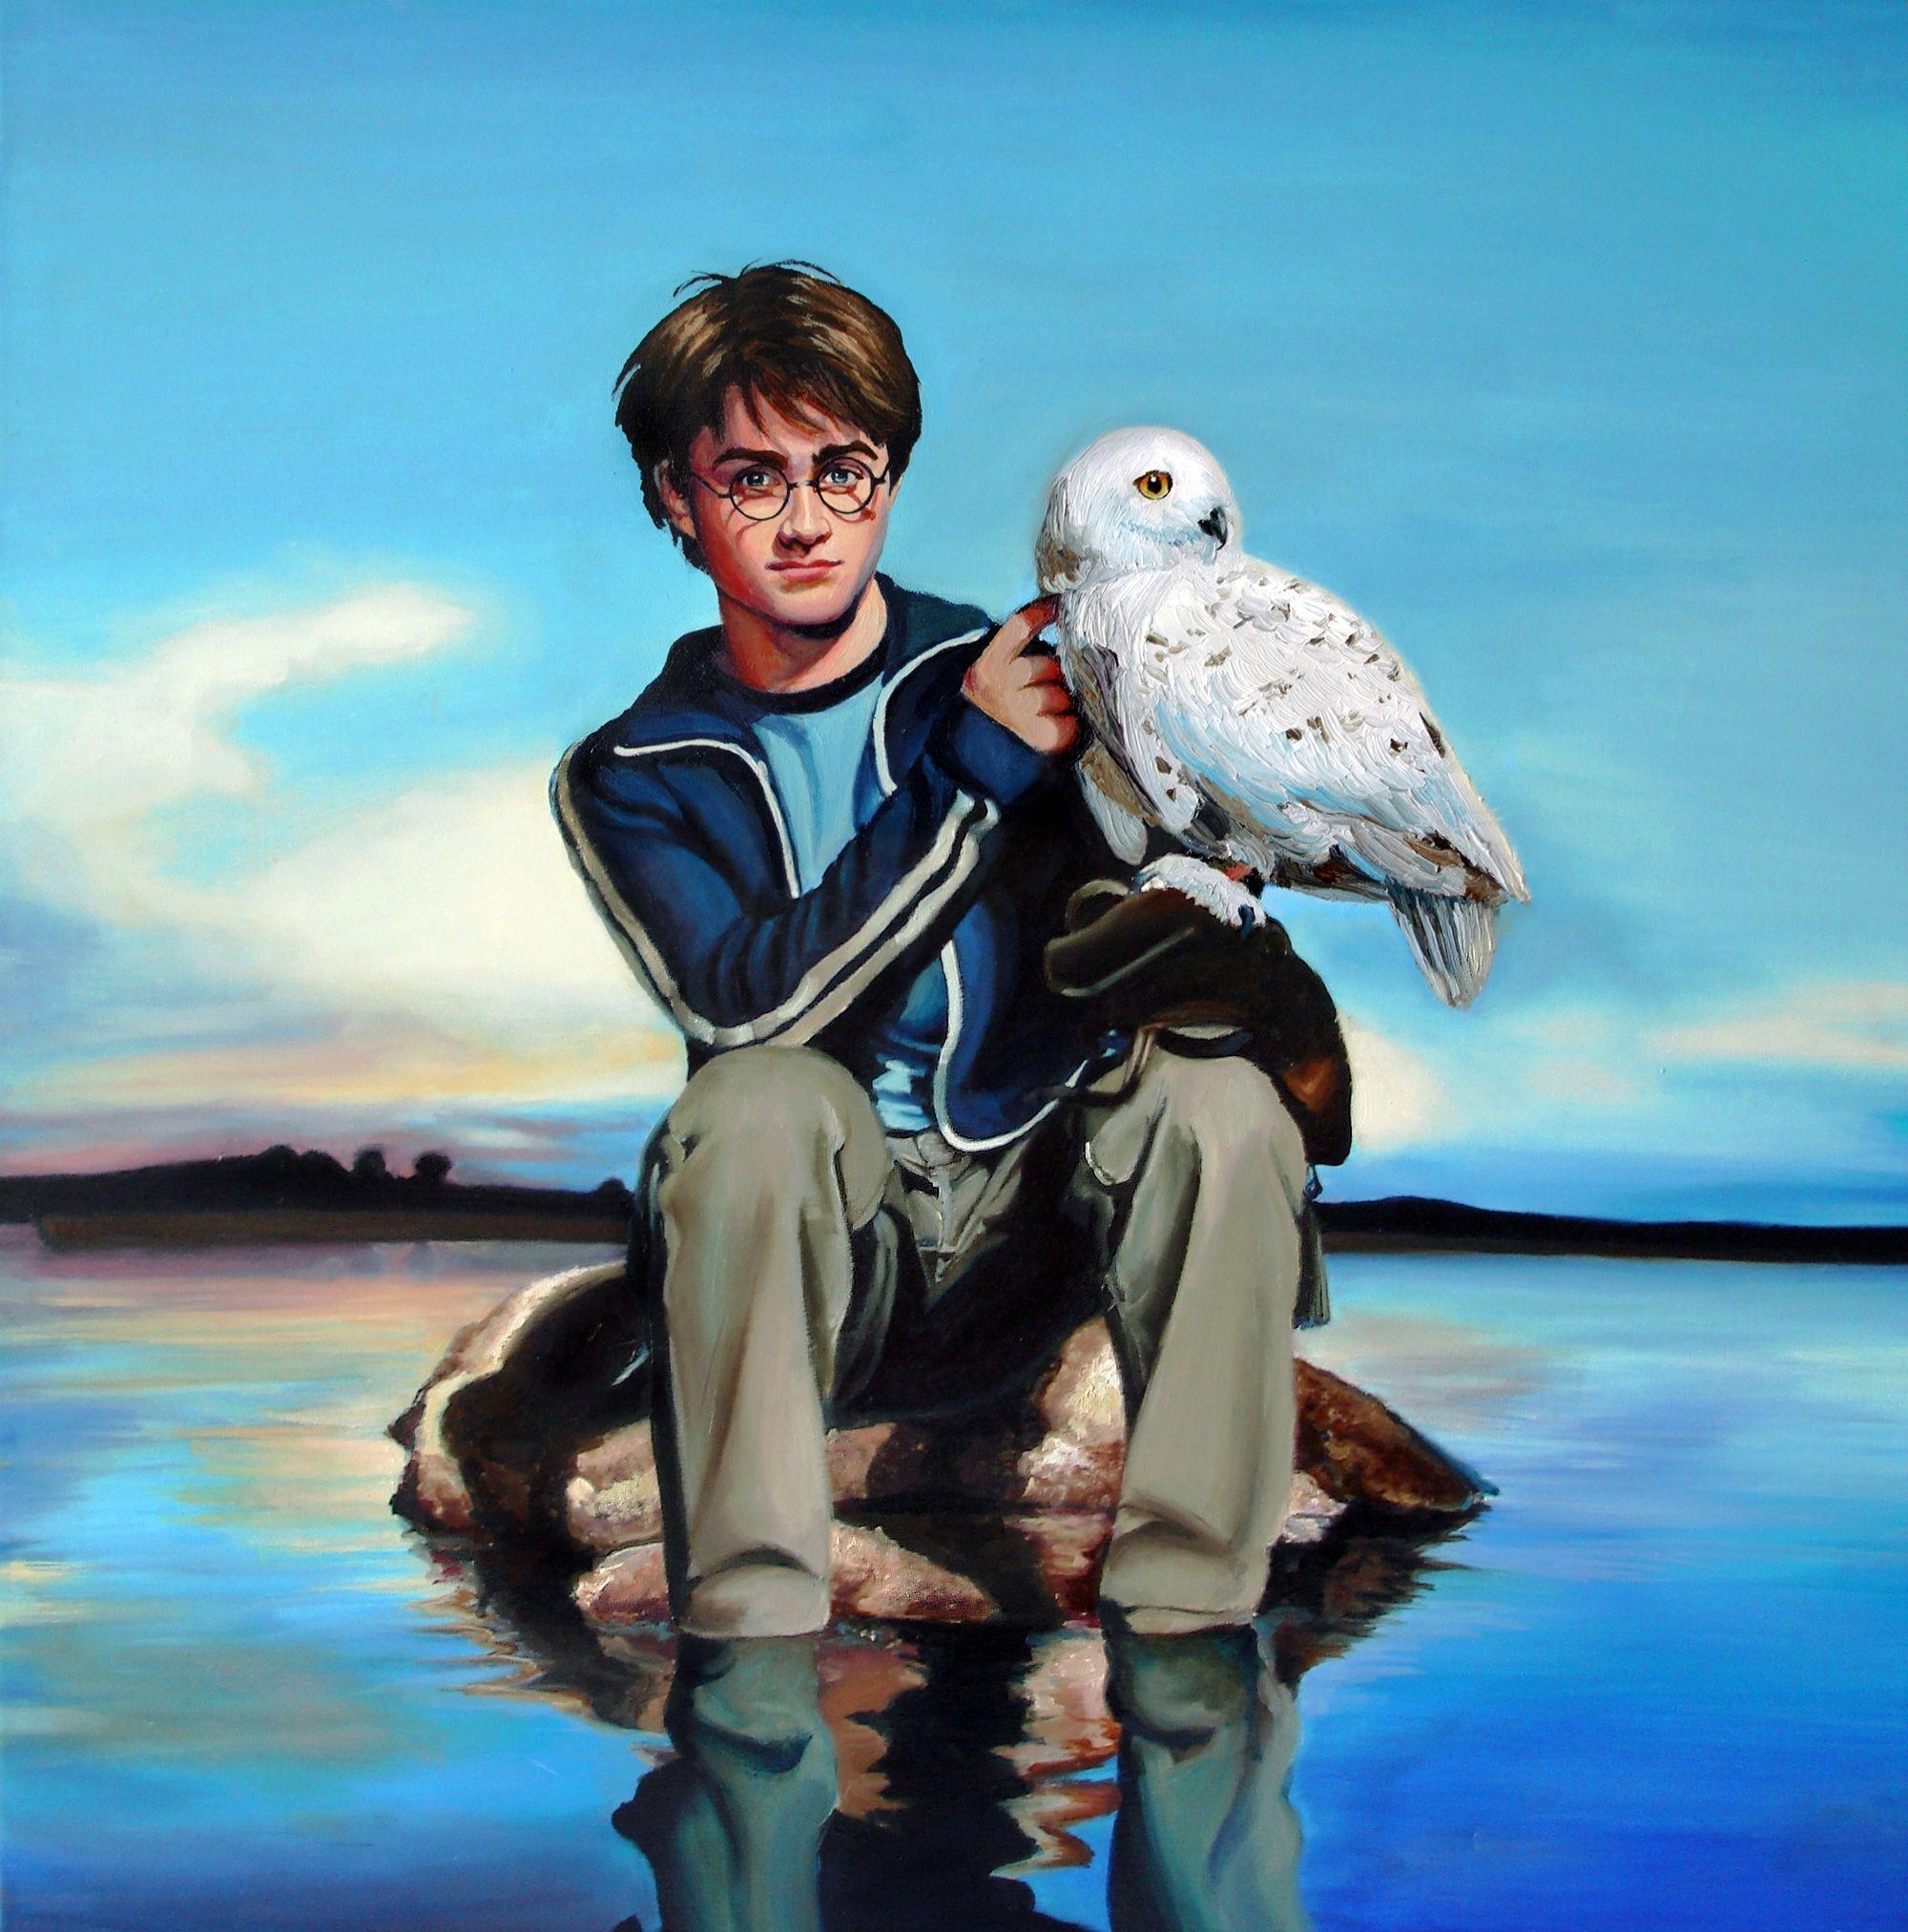 Harry potter - Harry With Hedwig Harry Potter Fan Art